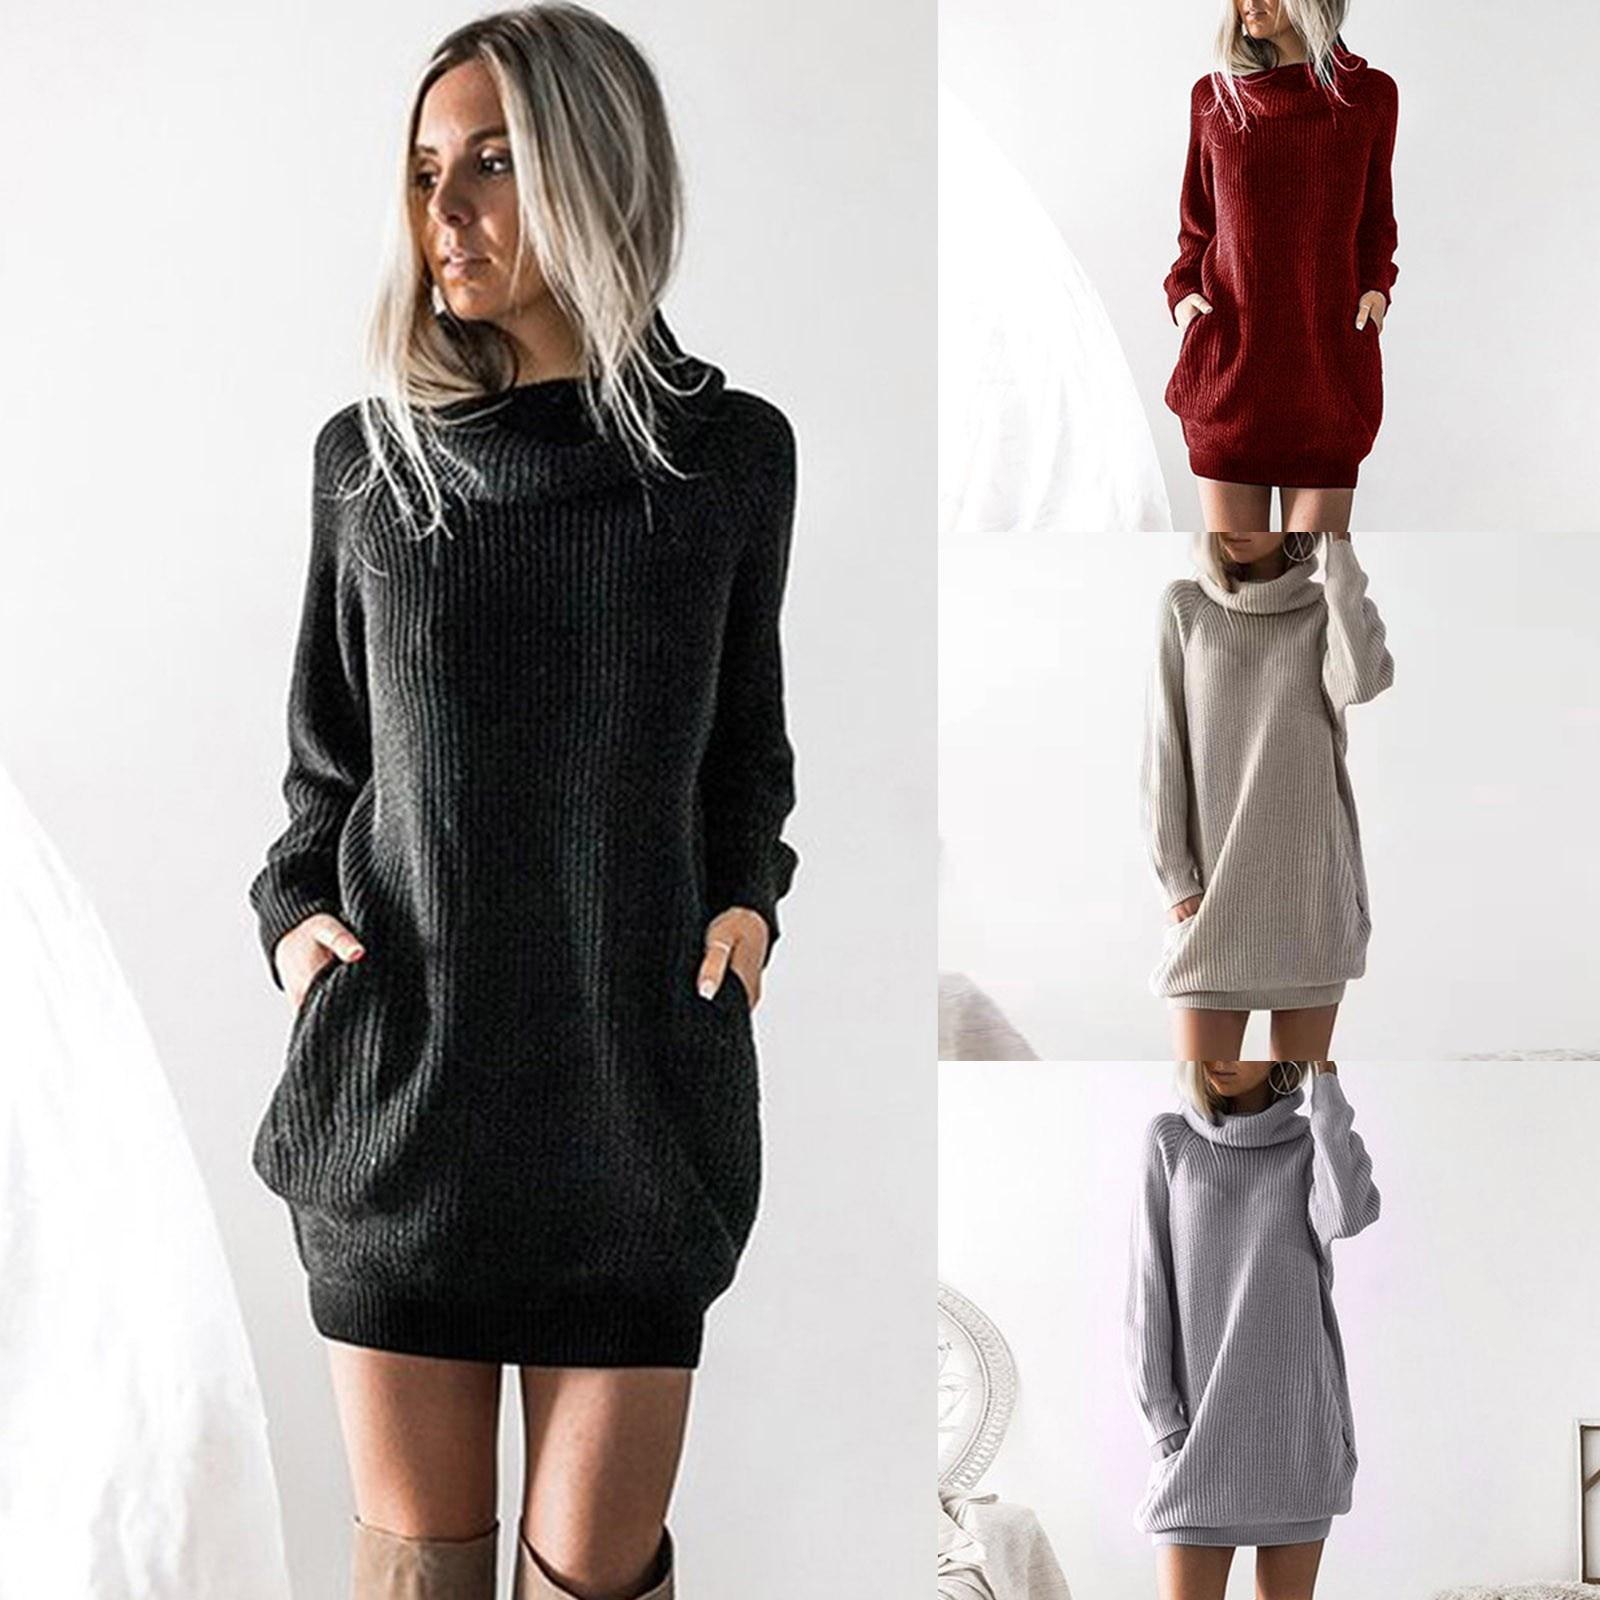 Autumn Winter Sweater Dress Solid Casual Dresses Womens Long Sleeve Turtleneck Knitted Dress Roll Neck Jumper Dress Ladies Mini